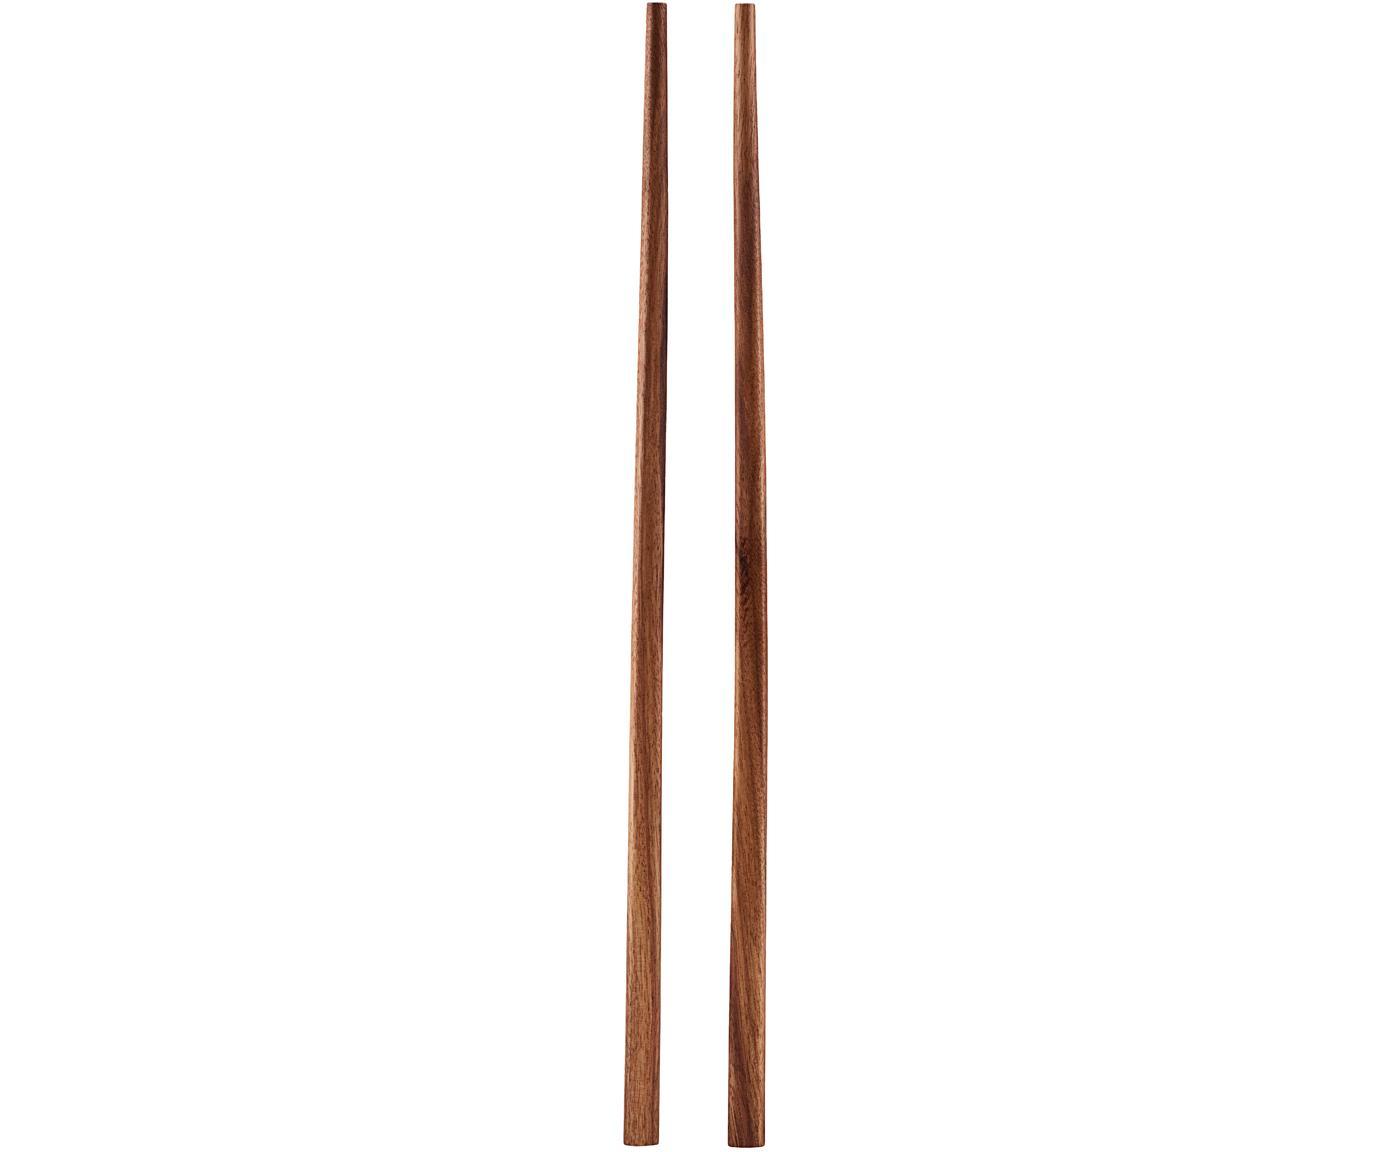 Eetstokjes Asia uit palawan hout, 3 paar, Palawan hout, Palawan houtkleurig, L 23 cm